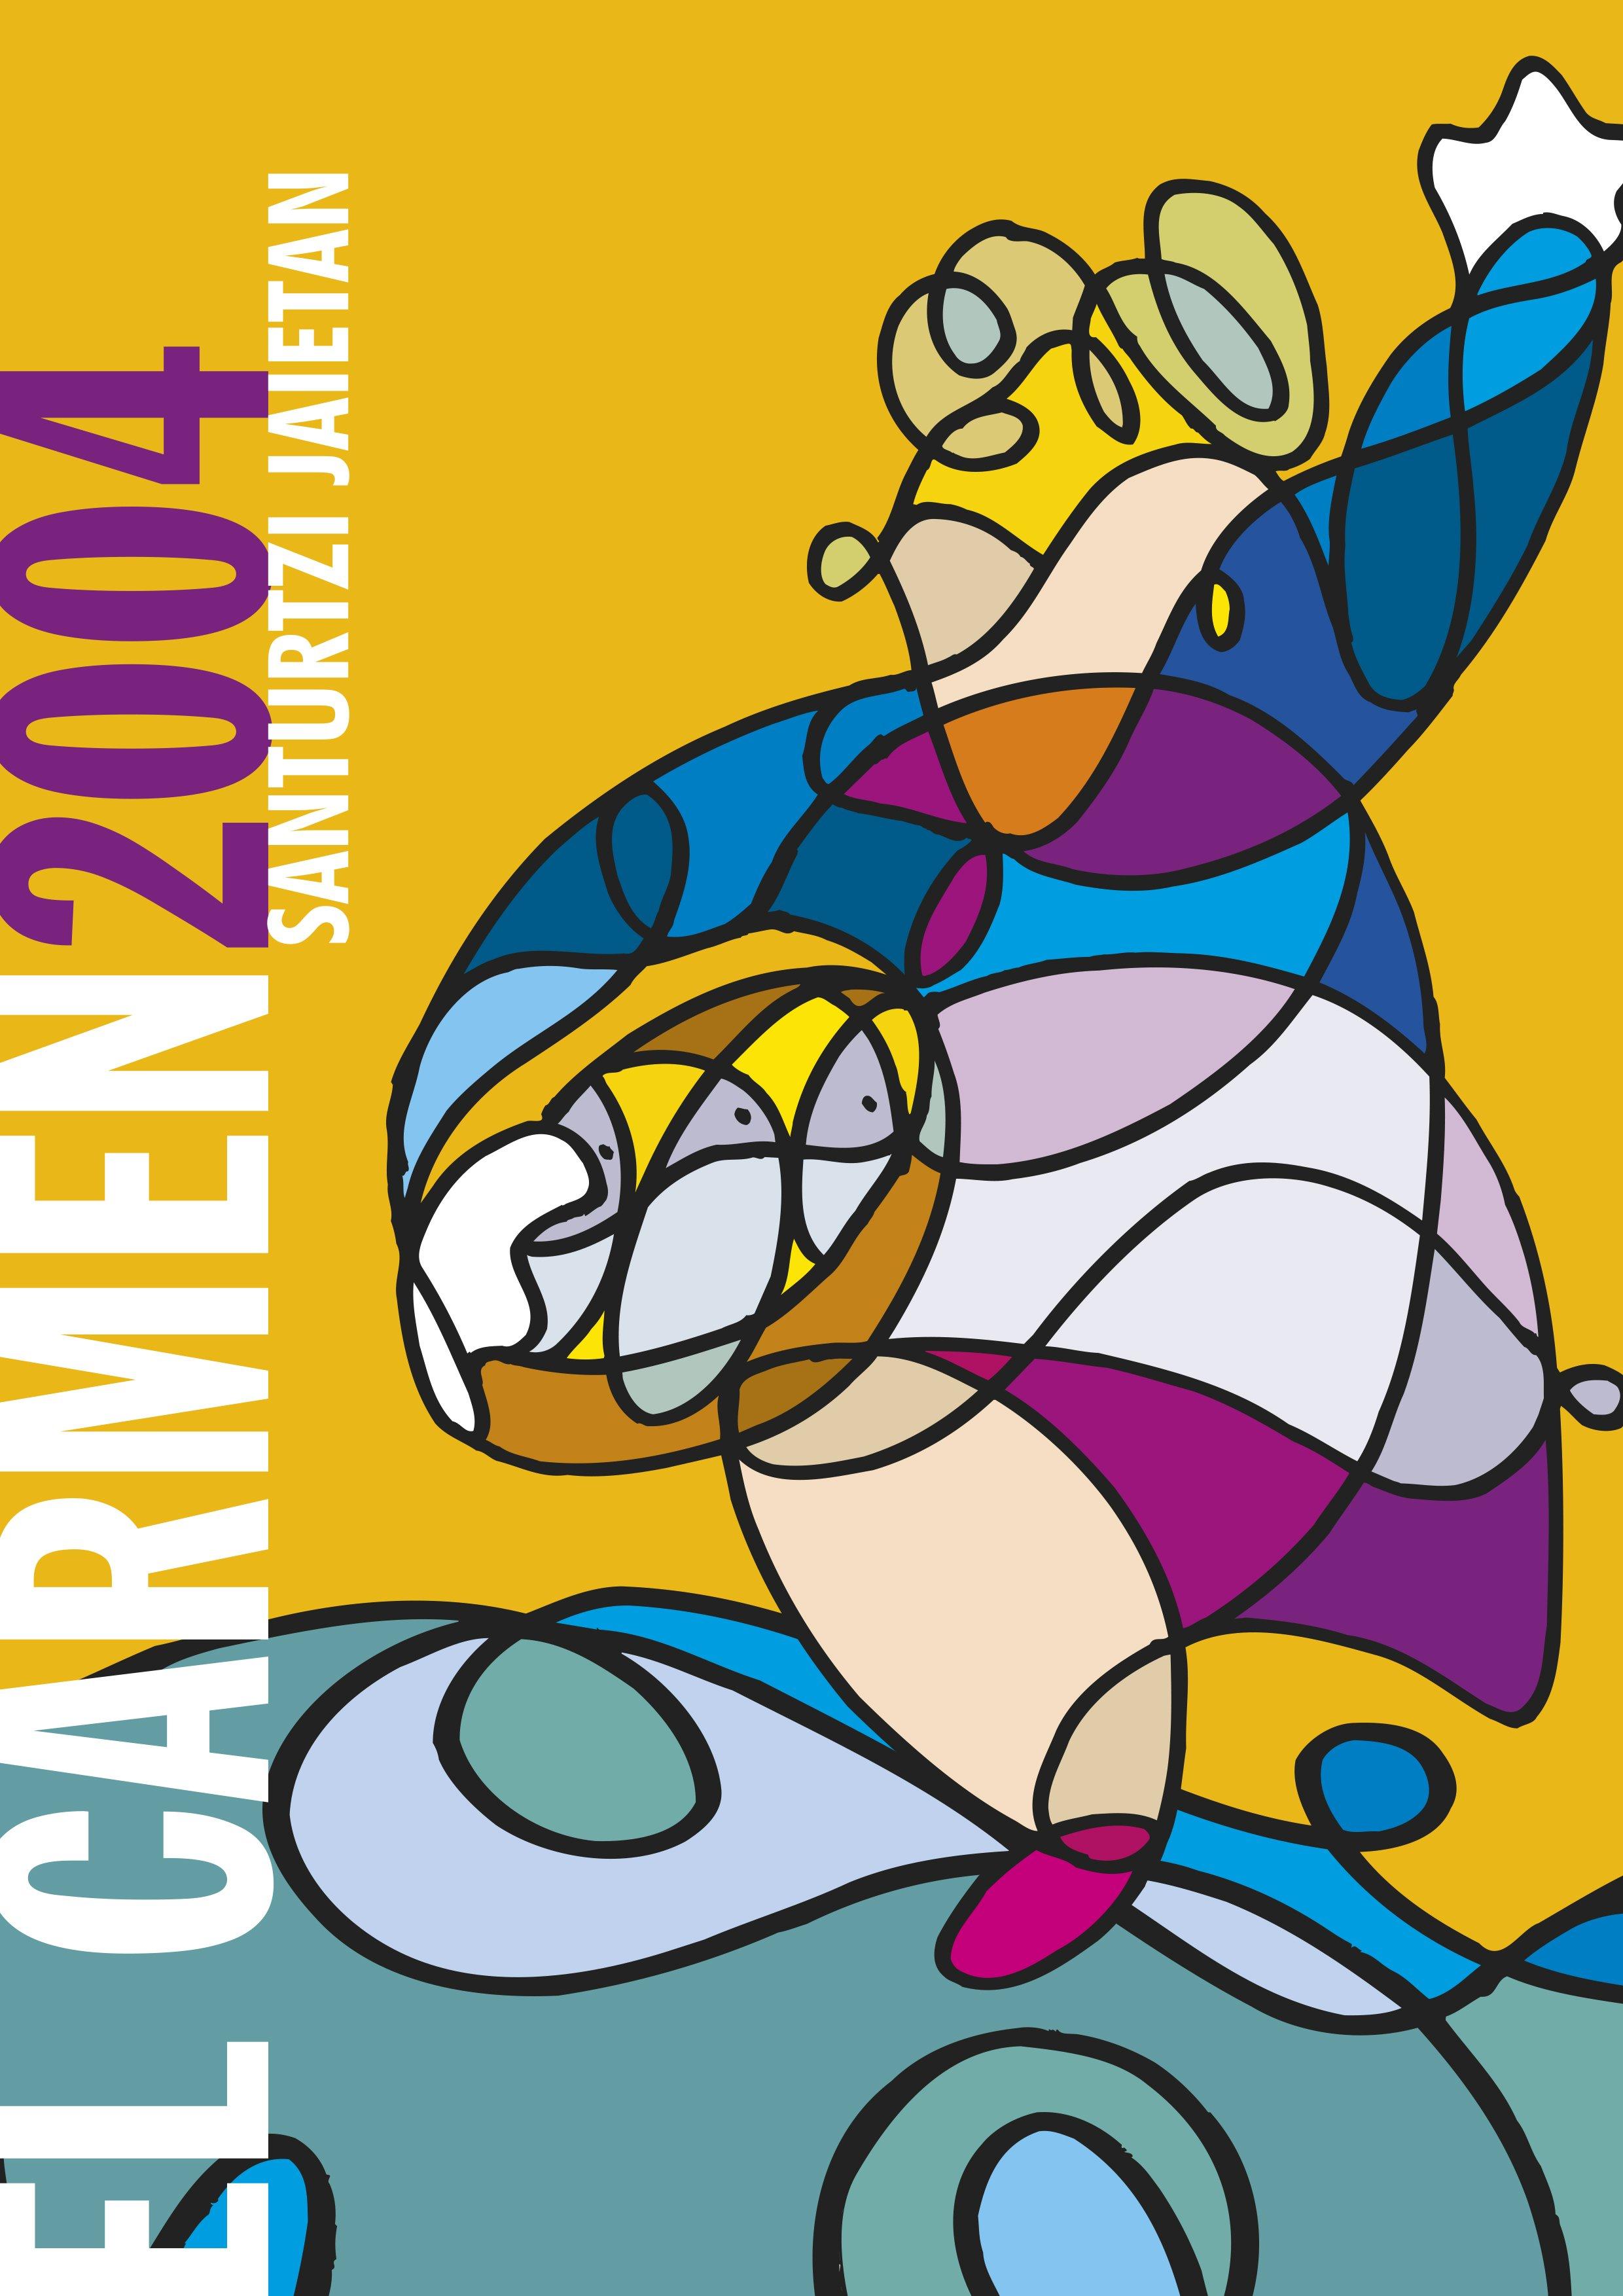 Cartel Fiestas Carmen 2004 (original)